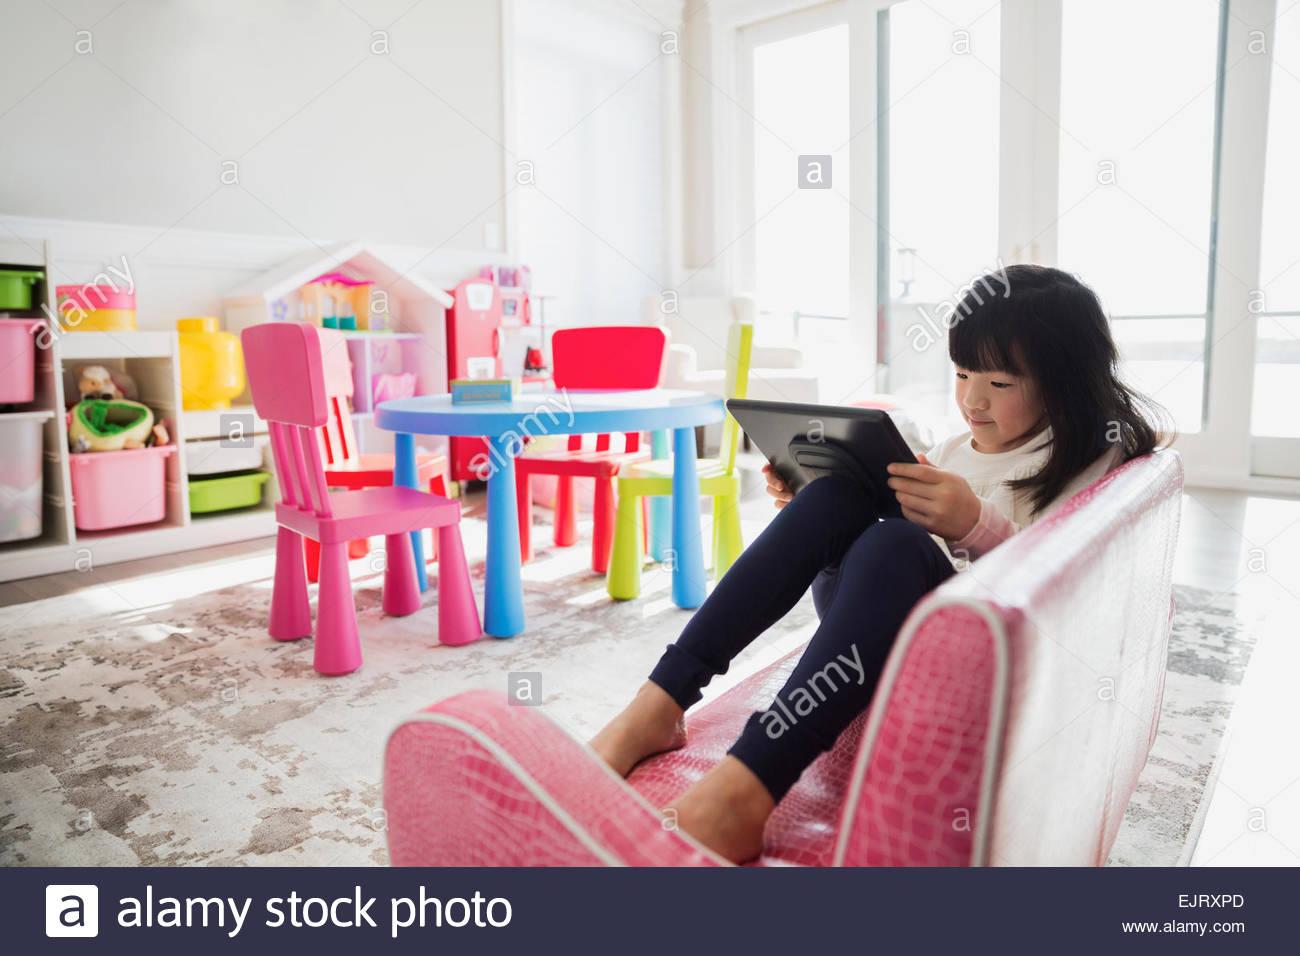 Girl using digital tablet on sofa in playroom Stock Photo